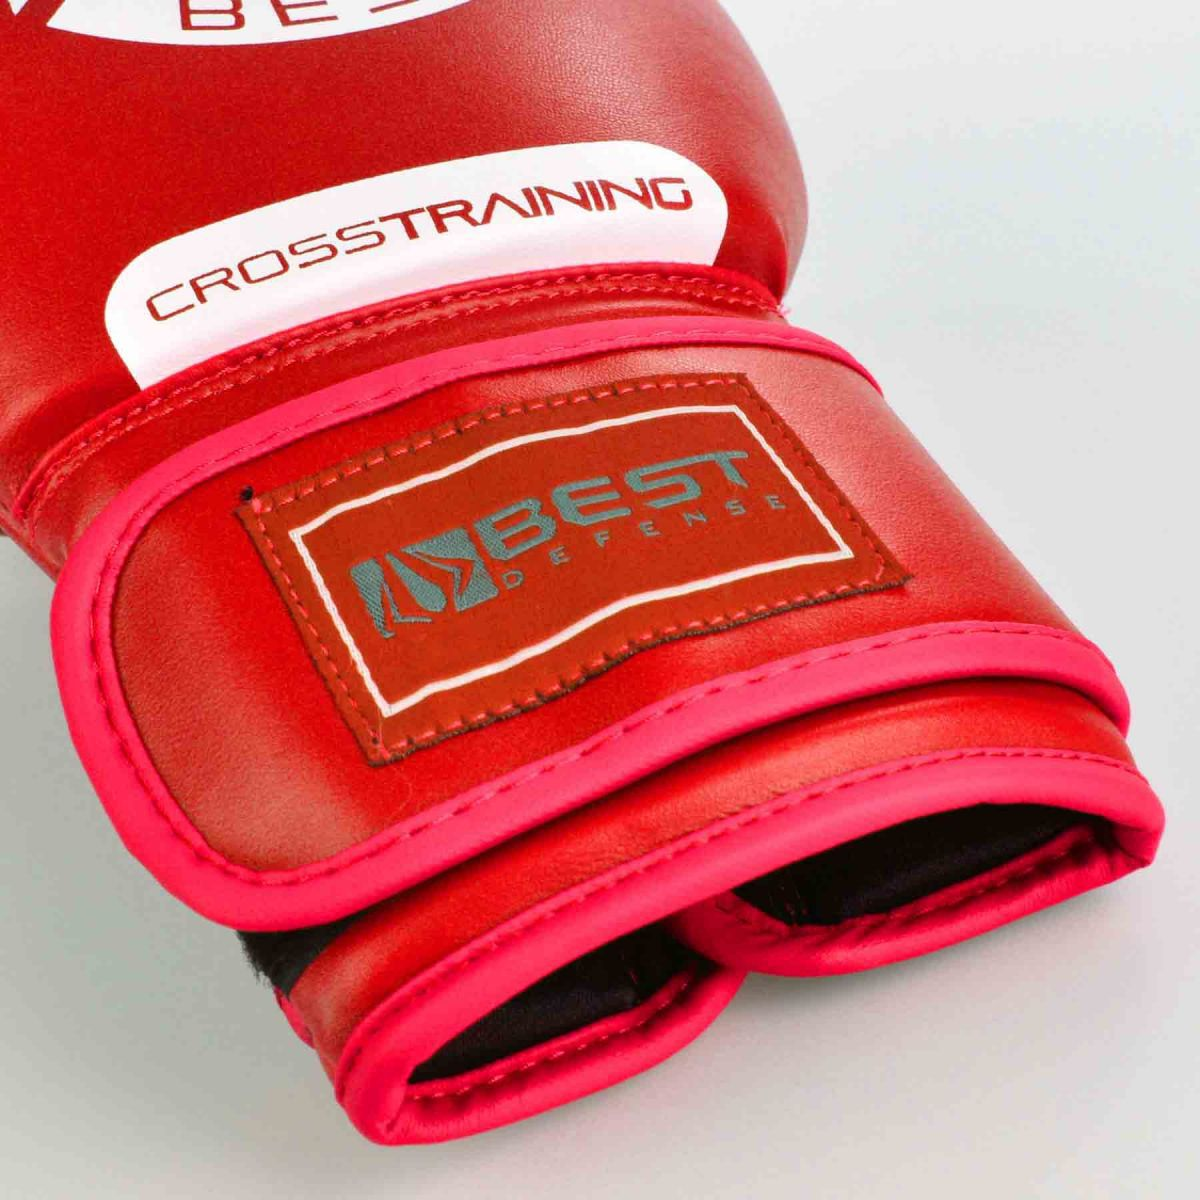 Luvas Boxe / Muay Thai - Cross Trainning- Best Defense - Vermelho - 10/12/14OZ .  - Loja do Competidor